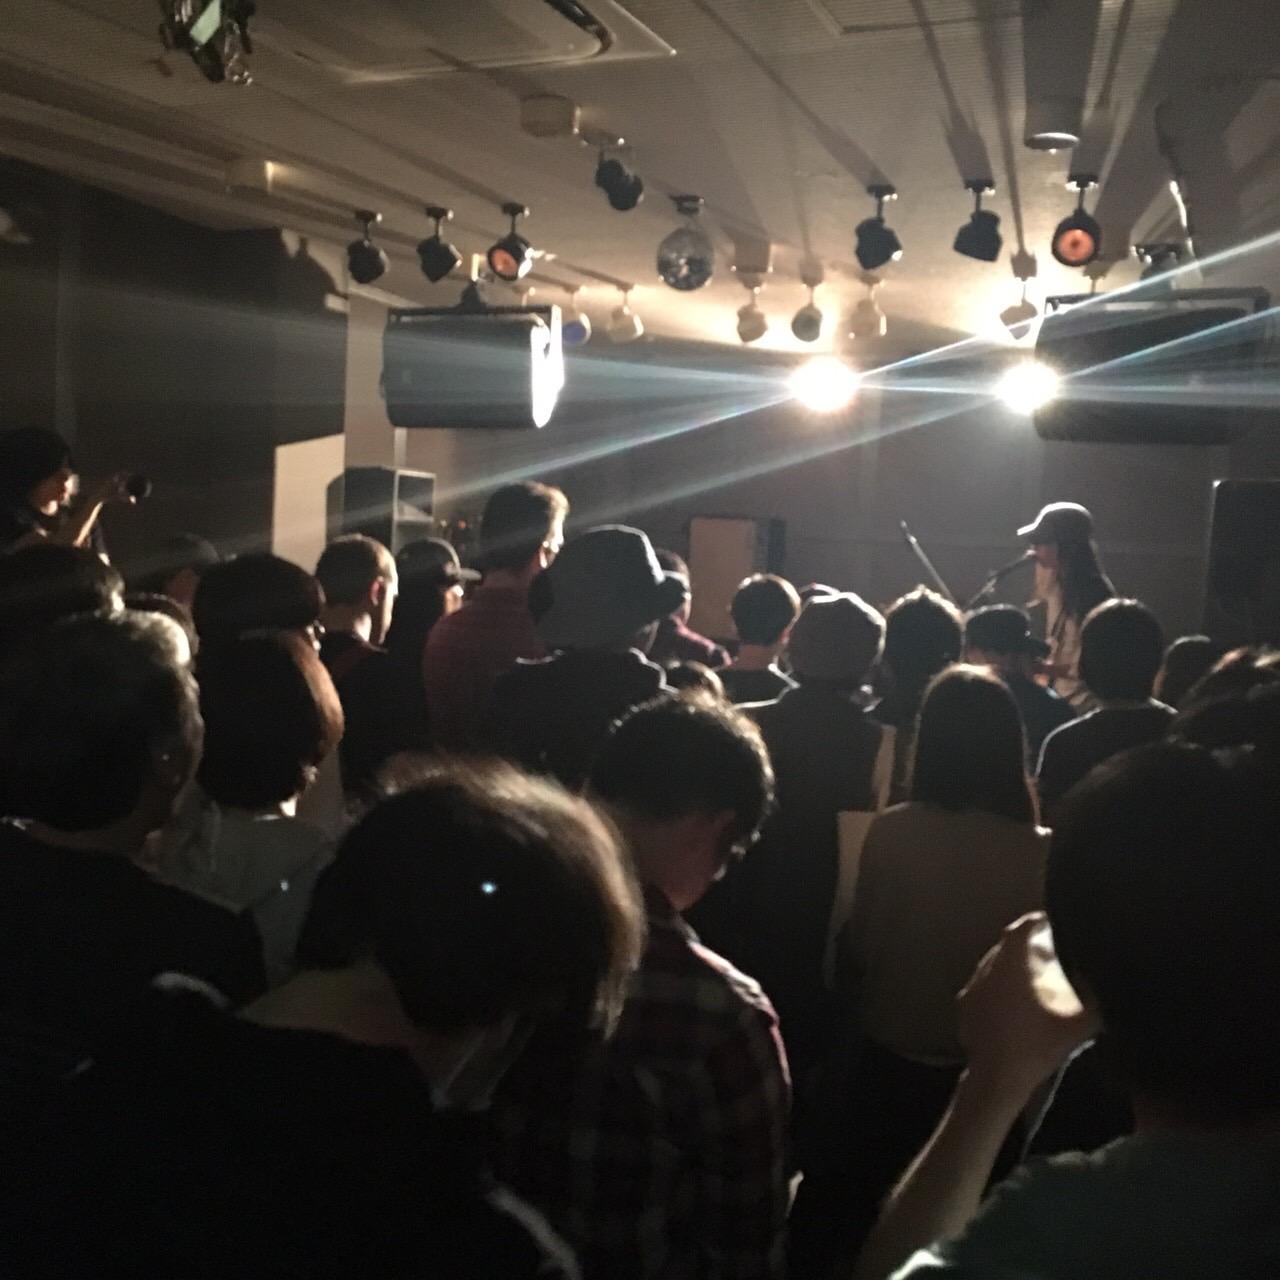 0416 Kyoto Shoegazer Noisy Pop Vol.4 Kyoto Nano Livehouse